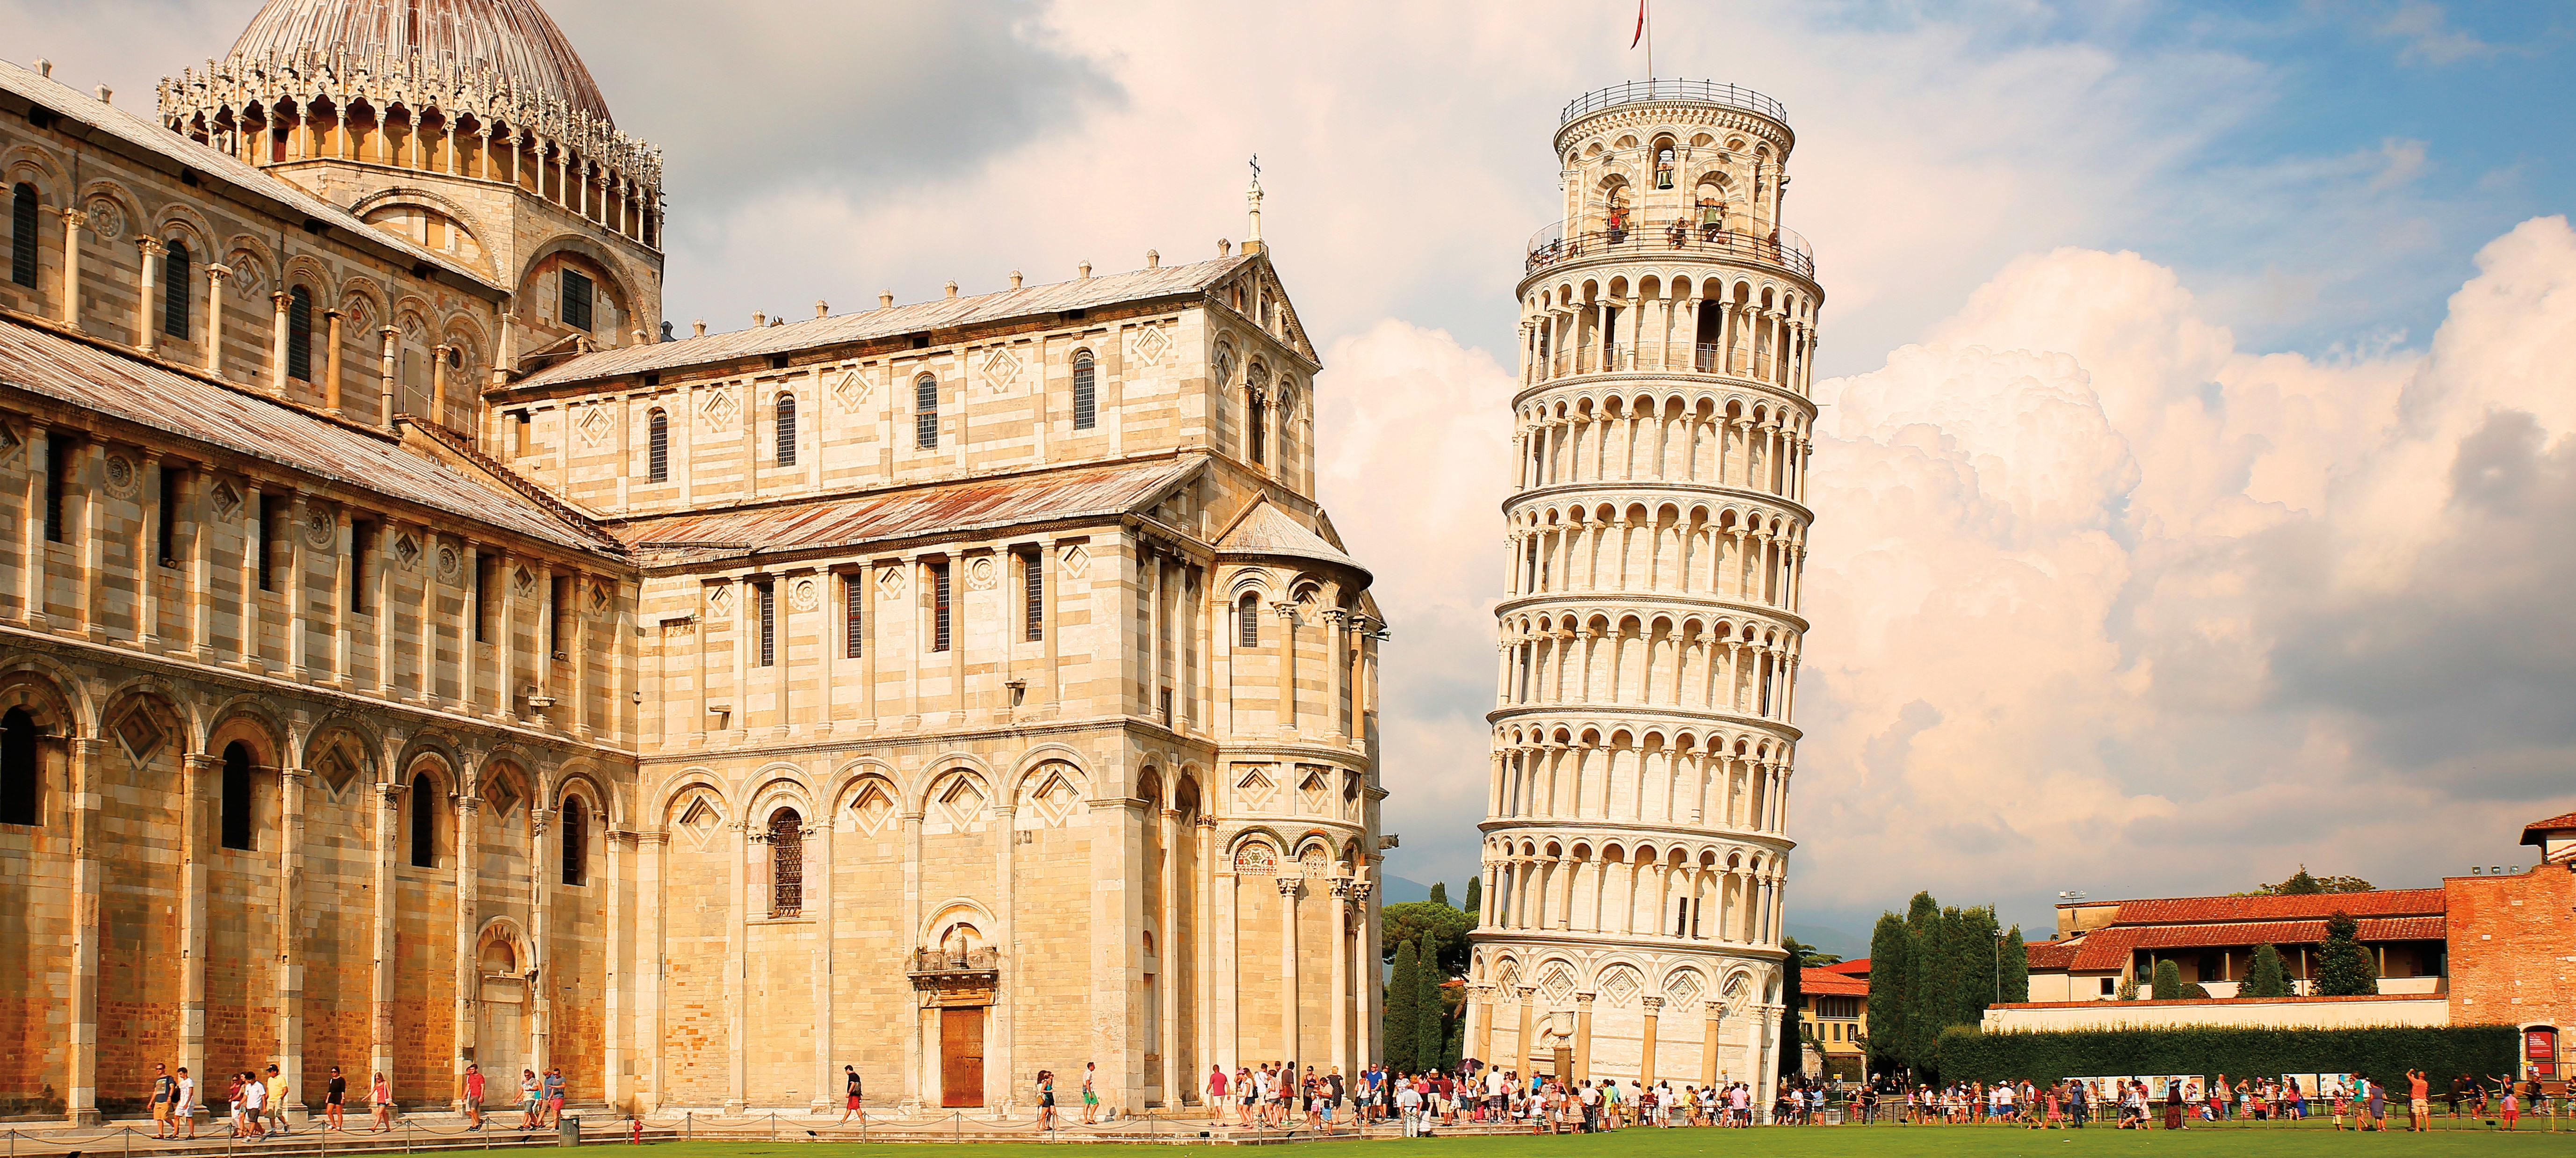 Pisa prediction